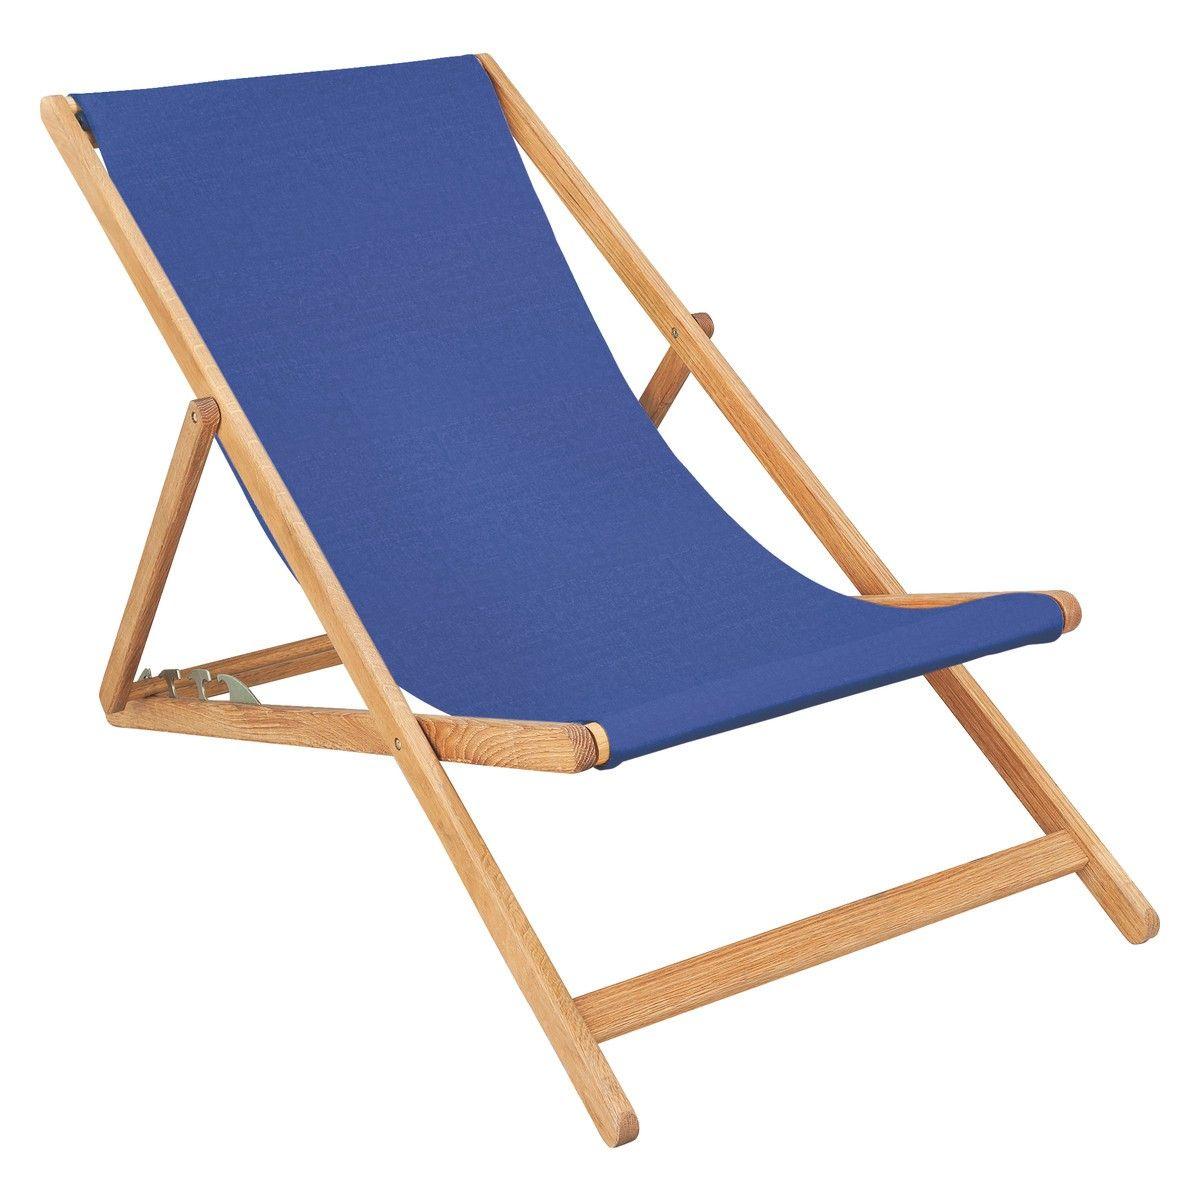 Strange Maui Oak Deckchair With Cobalt Blue Buy Now At Habitat Uk Alphanode Cool Chair Designs And Ideas Alphanodeonline